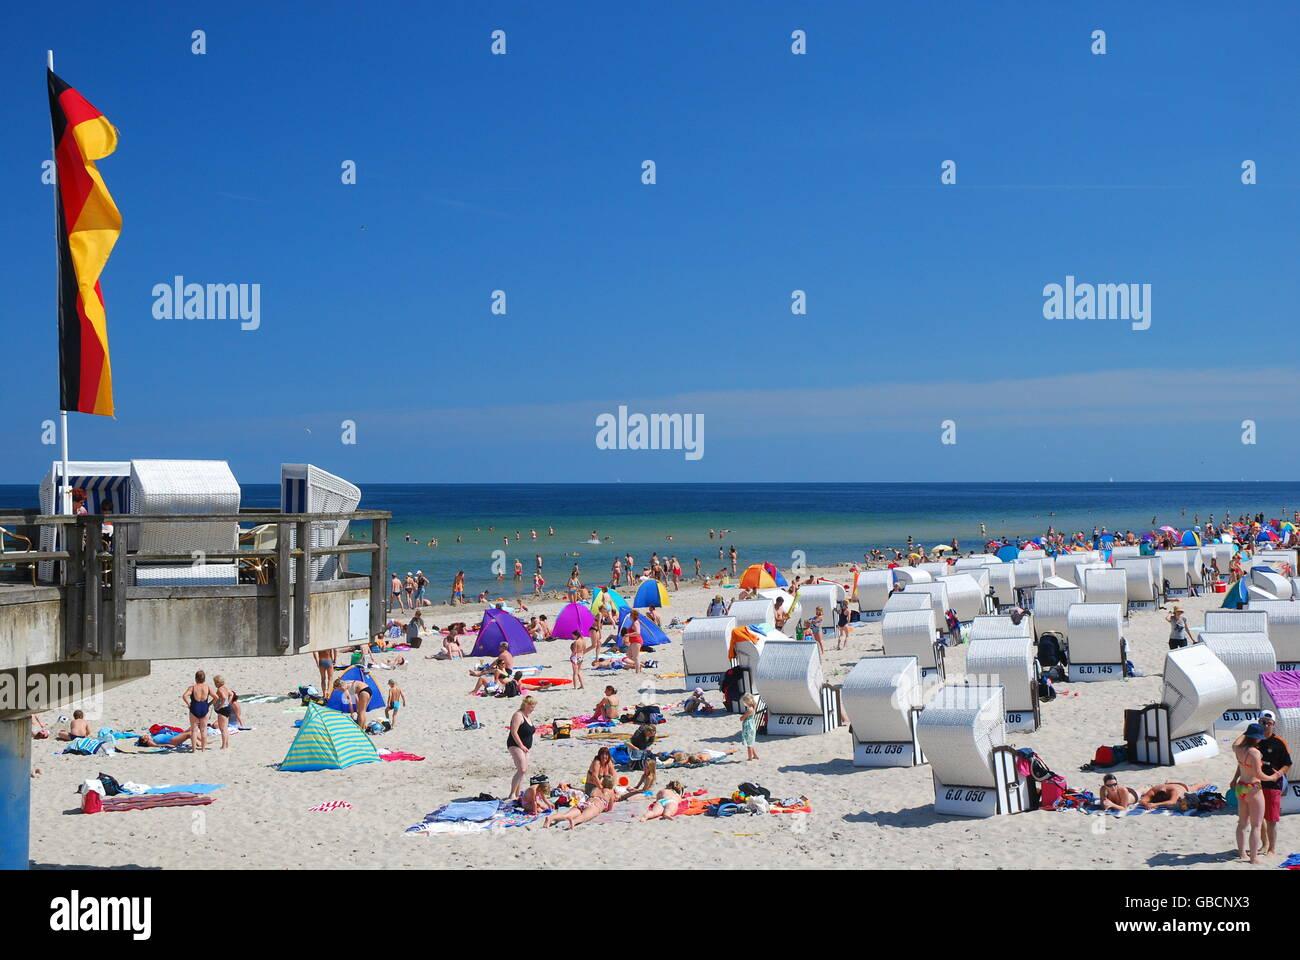 strand strandkoerbe seebad binz ostsee insel ruegen stock photo 110304043 alamy. Black Bedroom Furniture Sets. Home Design Ideas